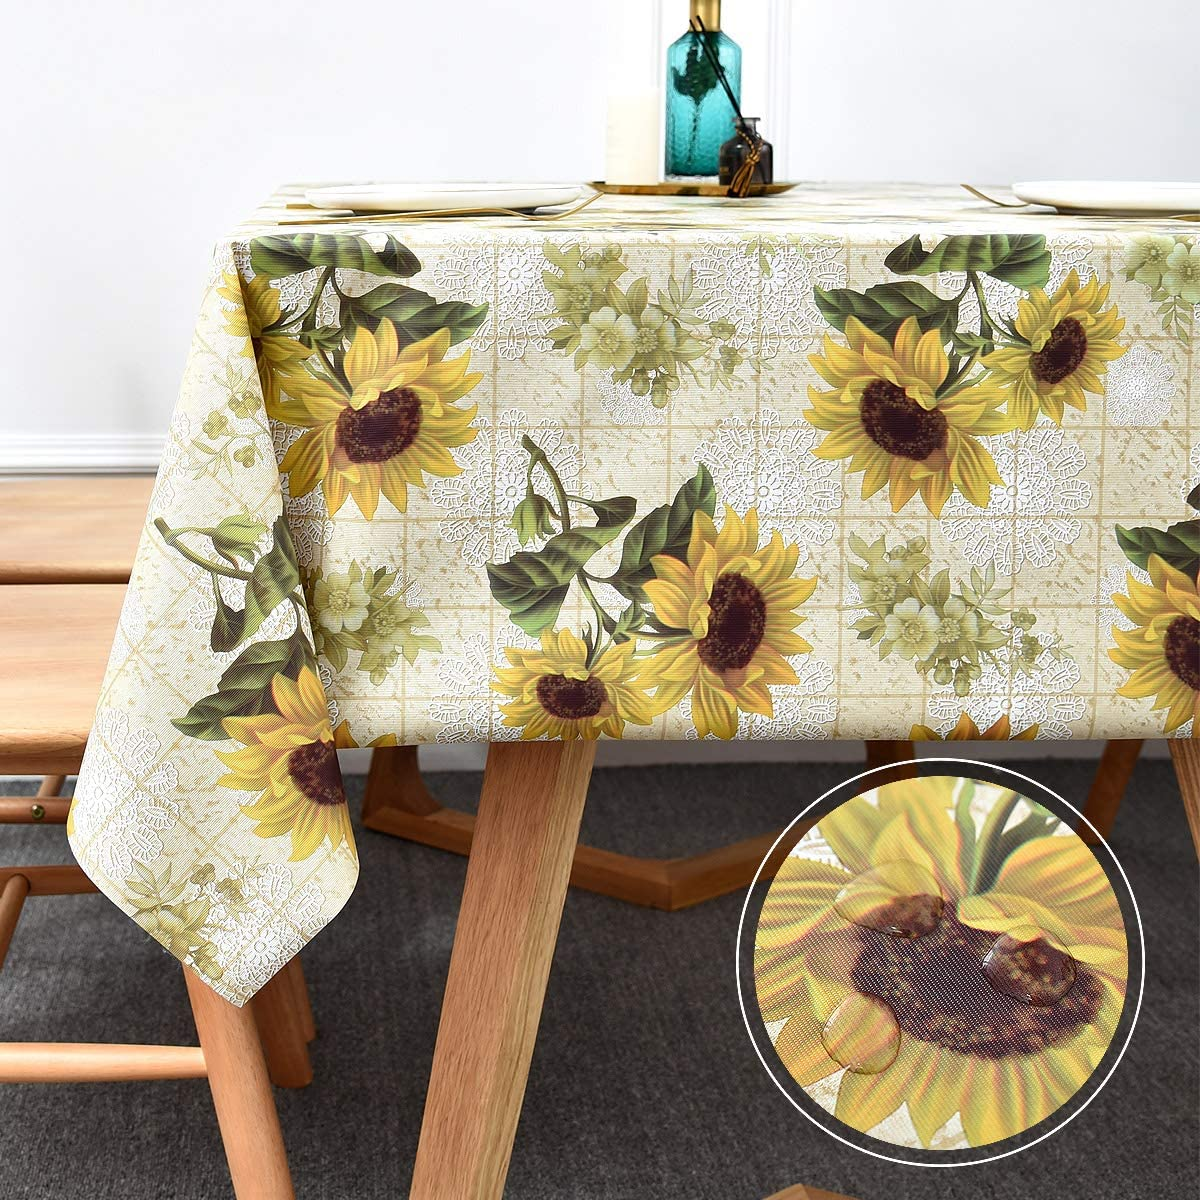 WATERPROOF Laminated LINEN fabric By YARD  Tablecloth 8mm Polka dot dots spots Tablecloth  ykfabrics JLW201: